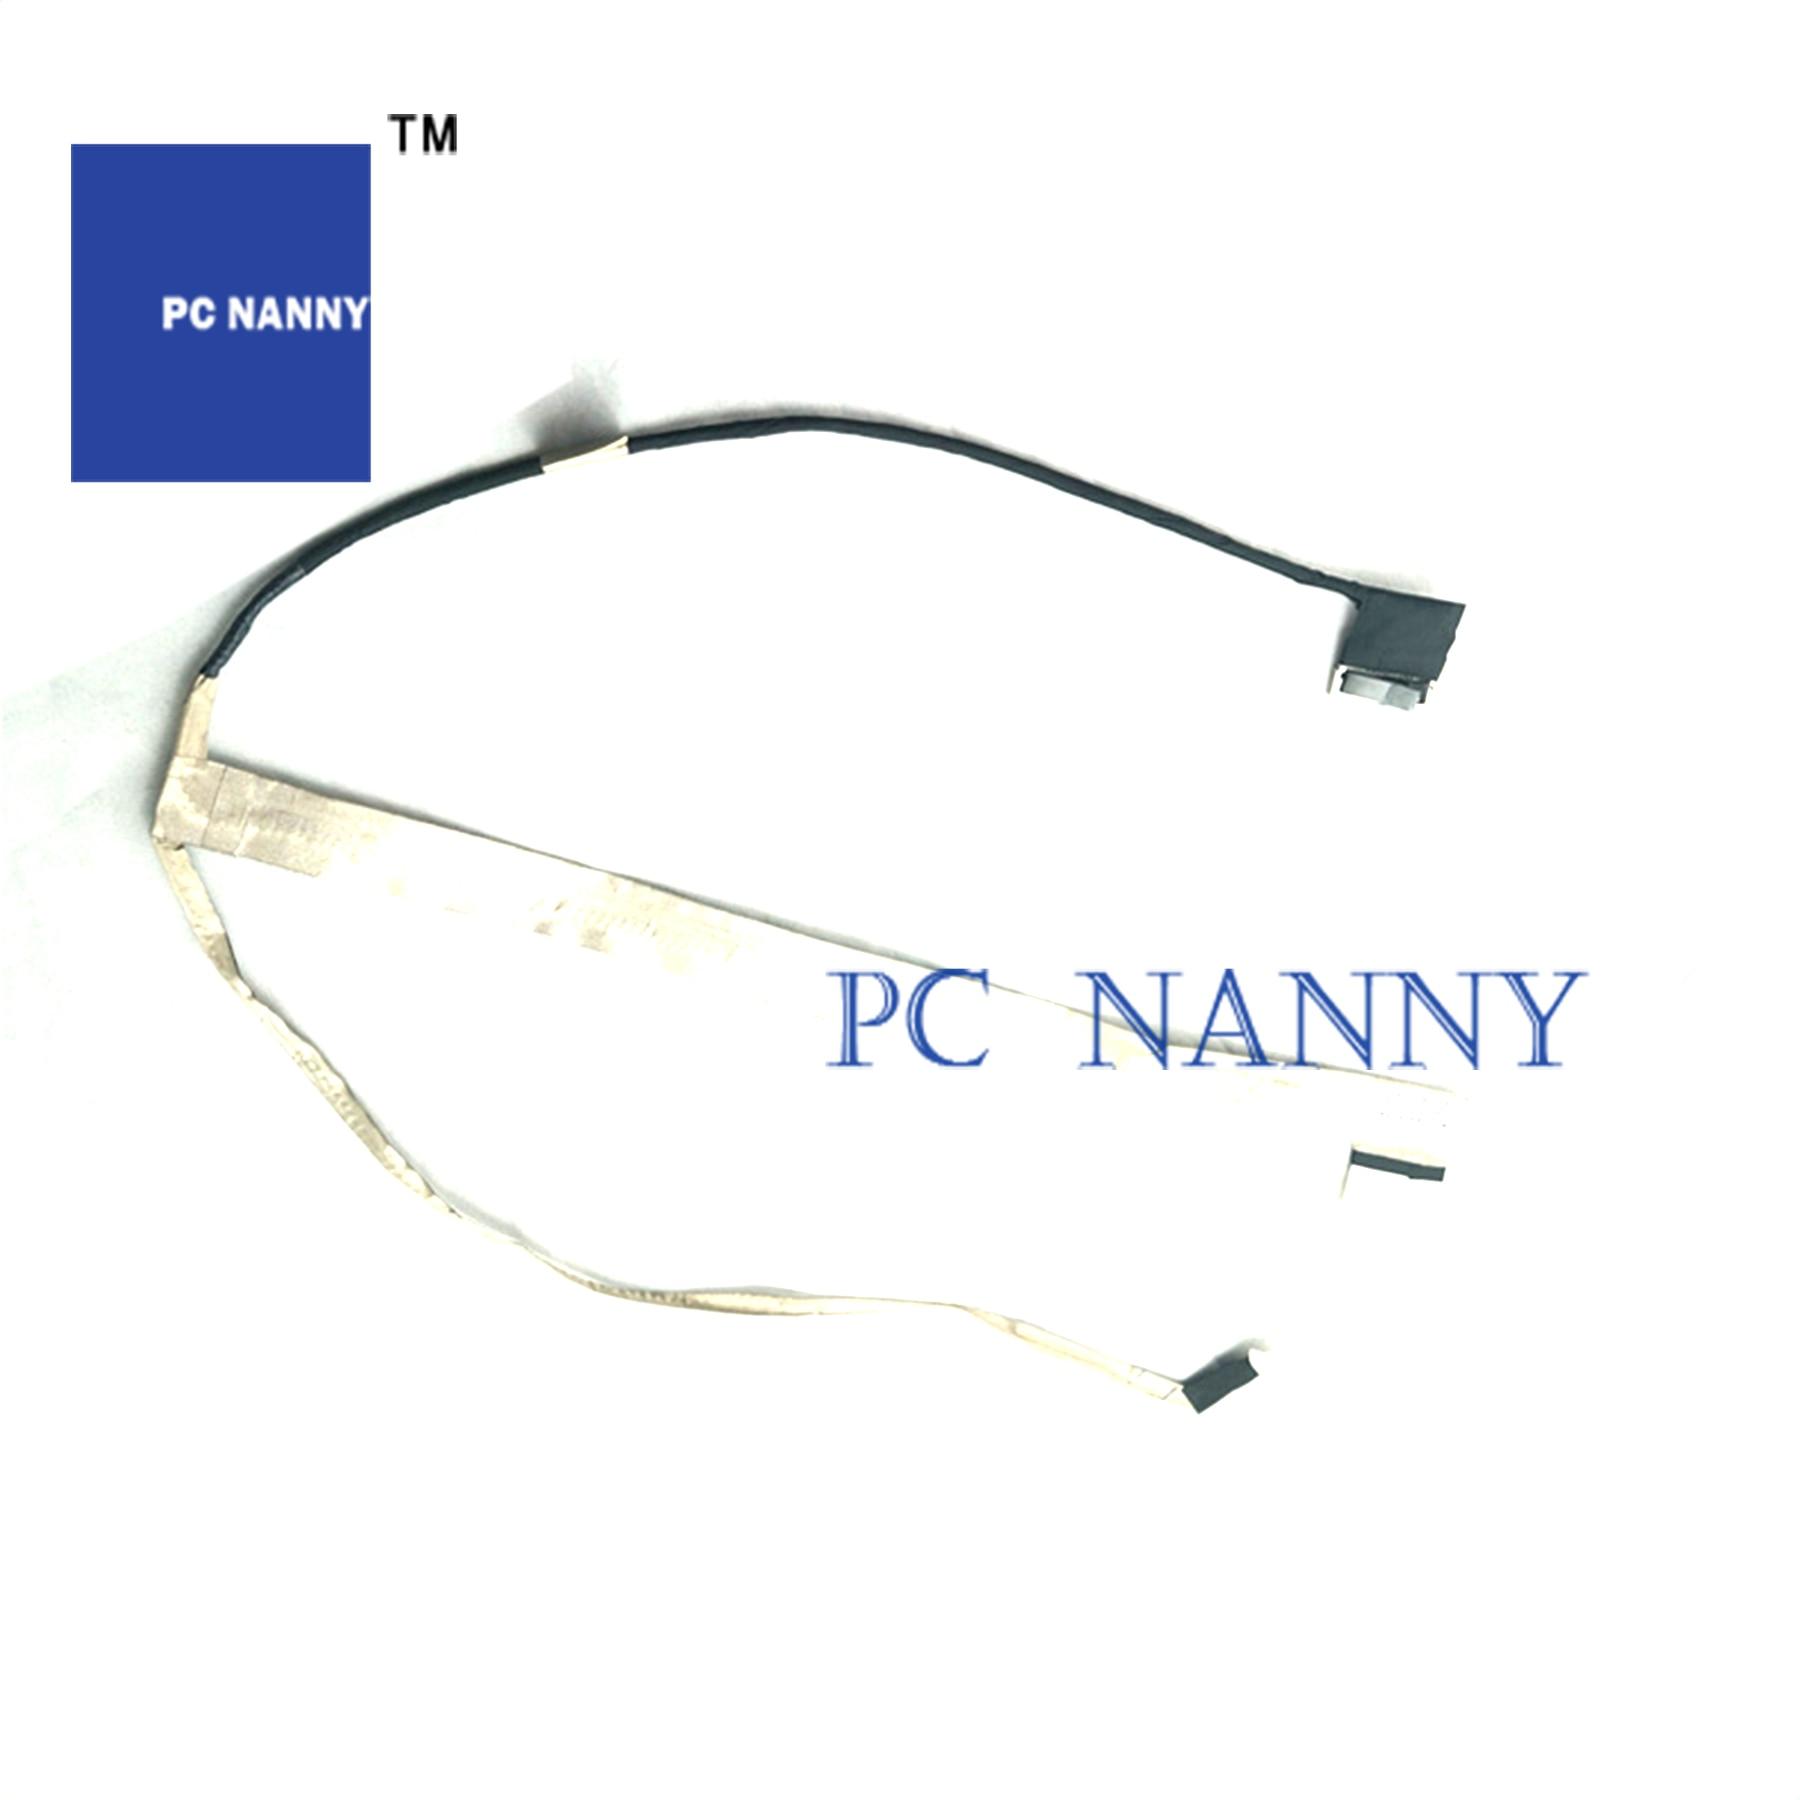 PCNANNY ل MSI CX620 MS-1688 MSI-175A LCD مرئيات K19-3025004-H58 K1N3030013H39